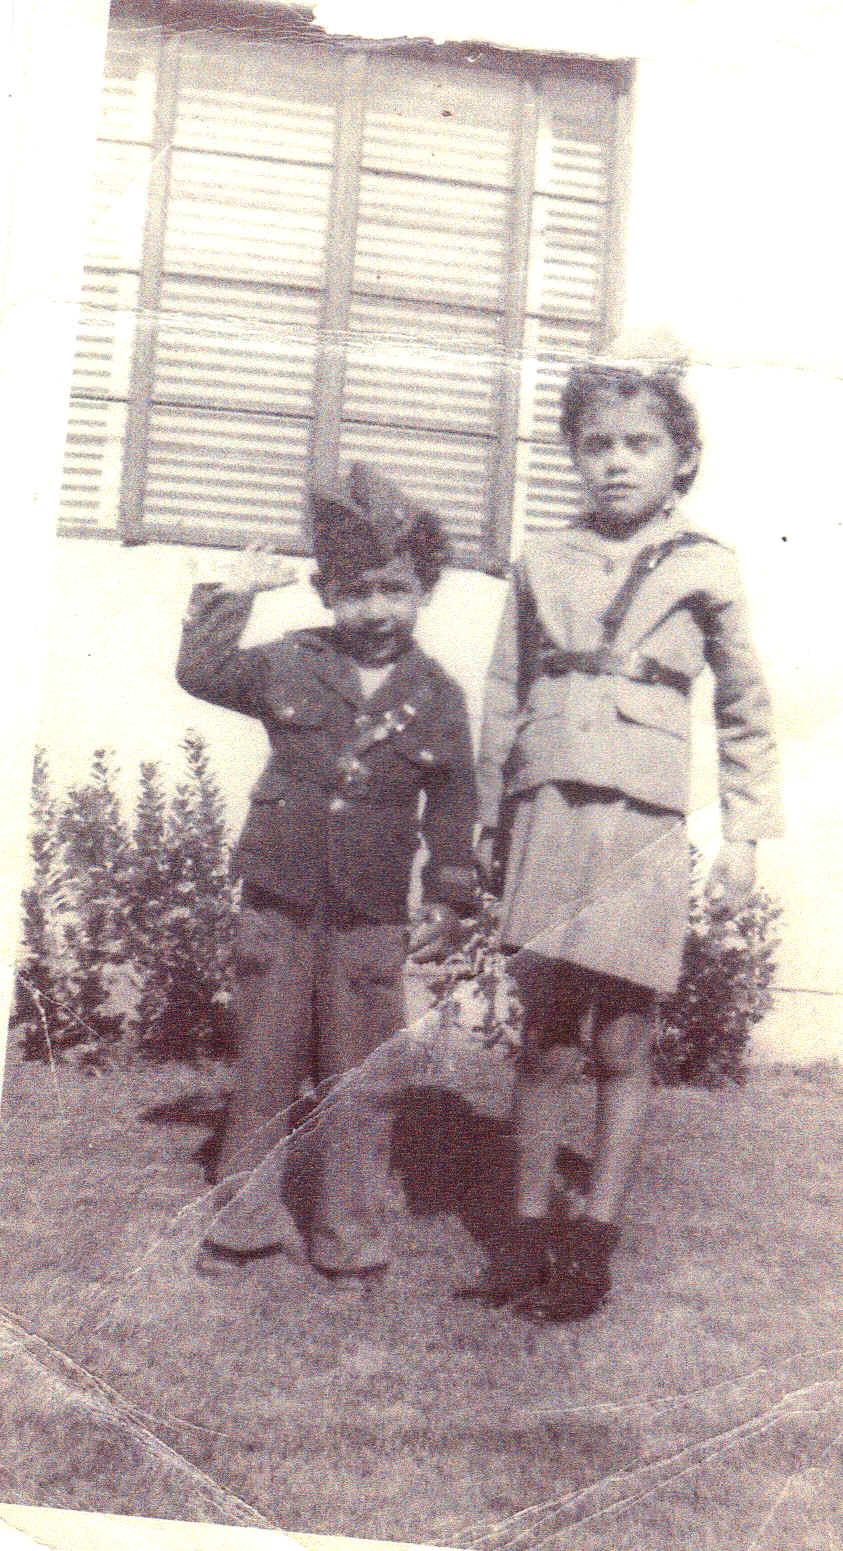 9 ARNOLD NOLLY5 TRUJILLO Eloise4 Castillo Bersabe C3 Espinosa Eloisa2 Aguayo Loreto1 Was Born In 1914 San Salvador Riverside